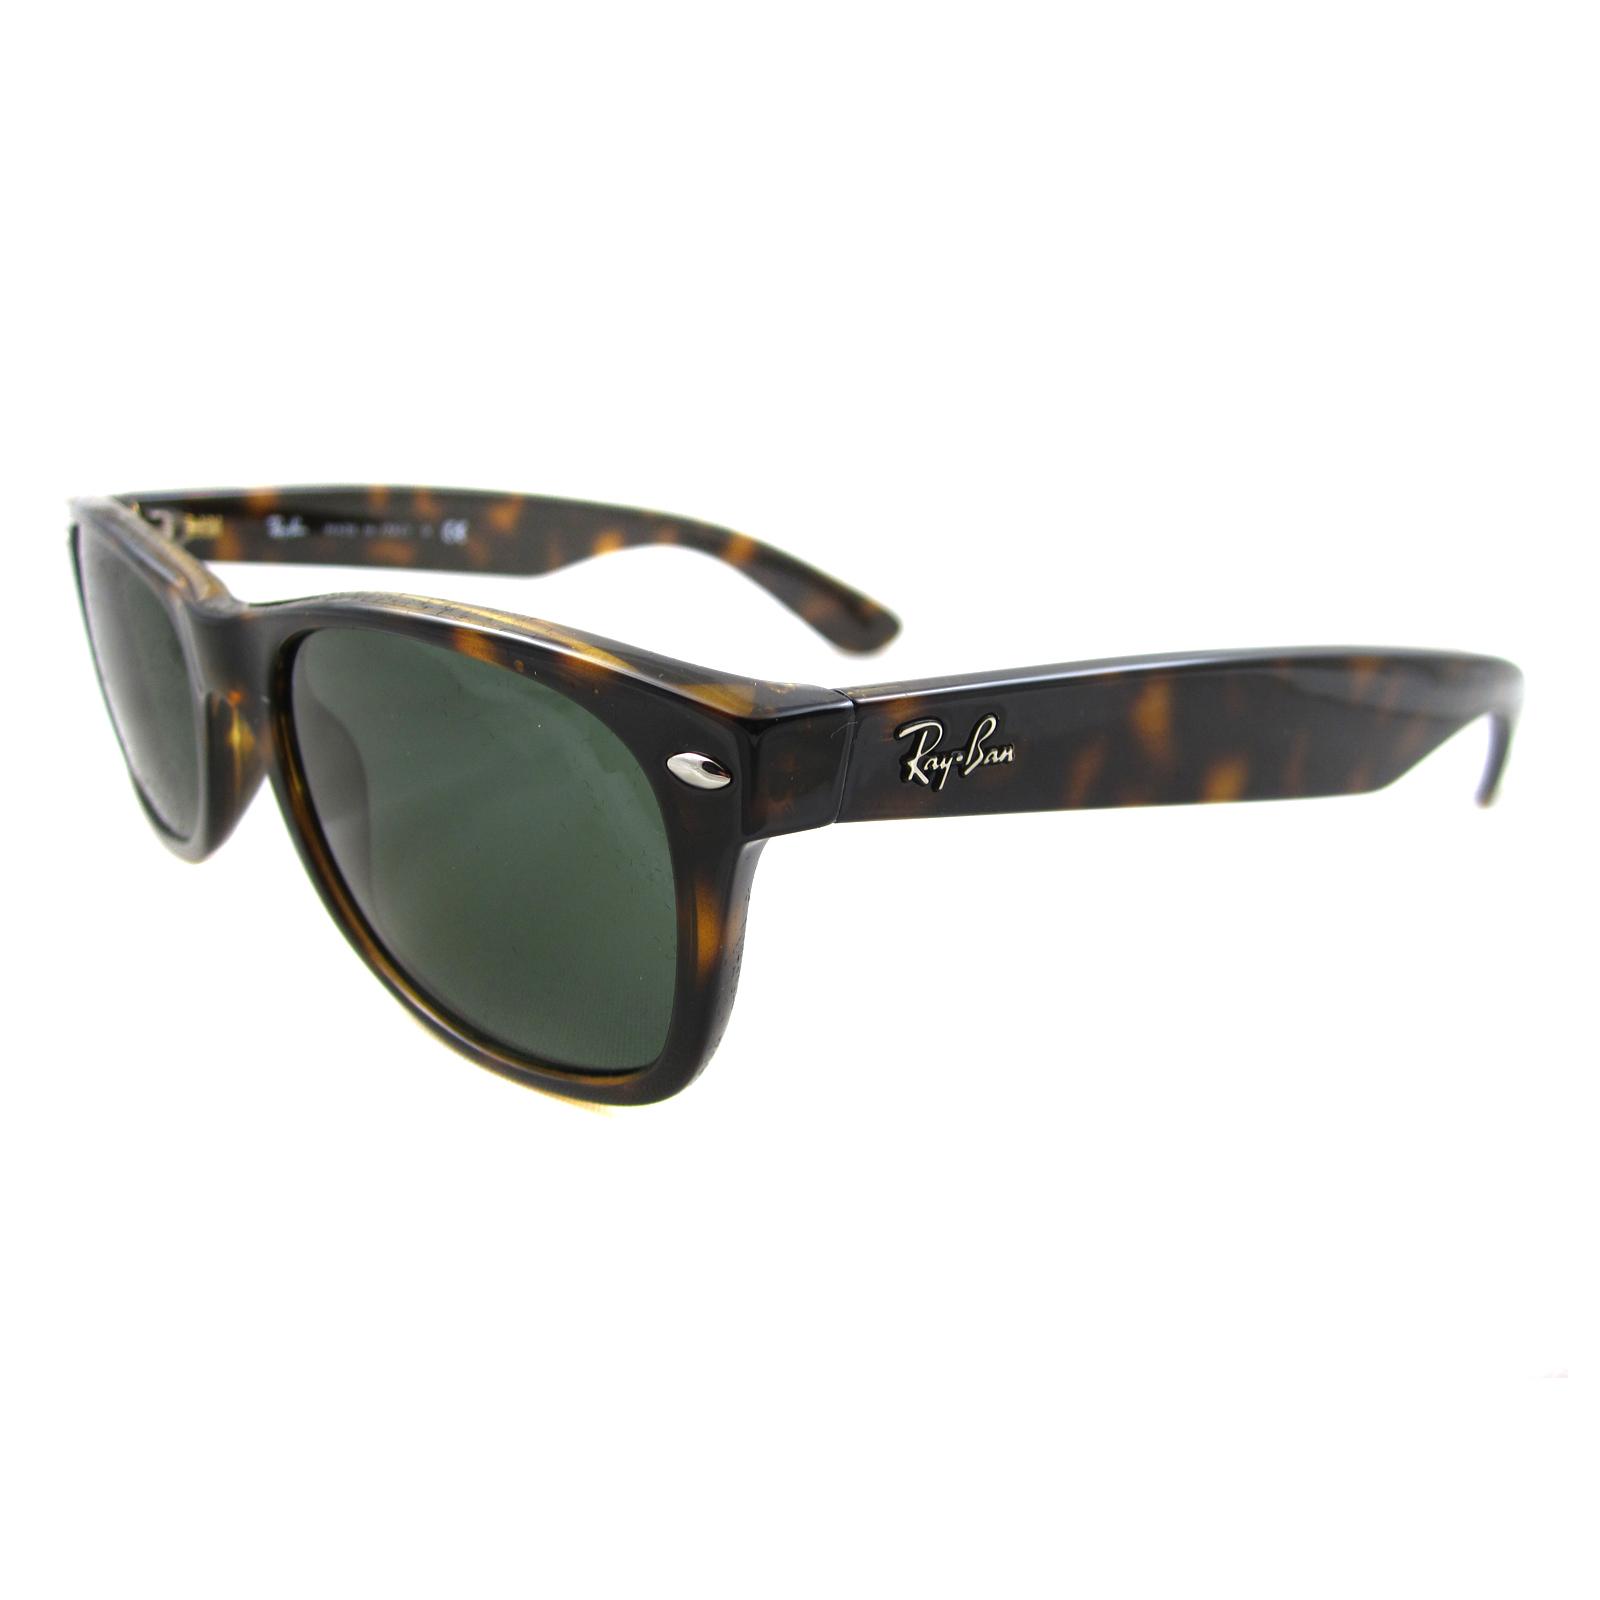 f3e3cf12fd Sentinel Ray-Ban Sunglasses New Wayfarer 2132 902 Tortoise Green Small